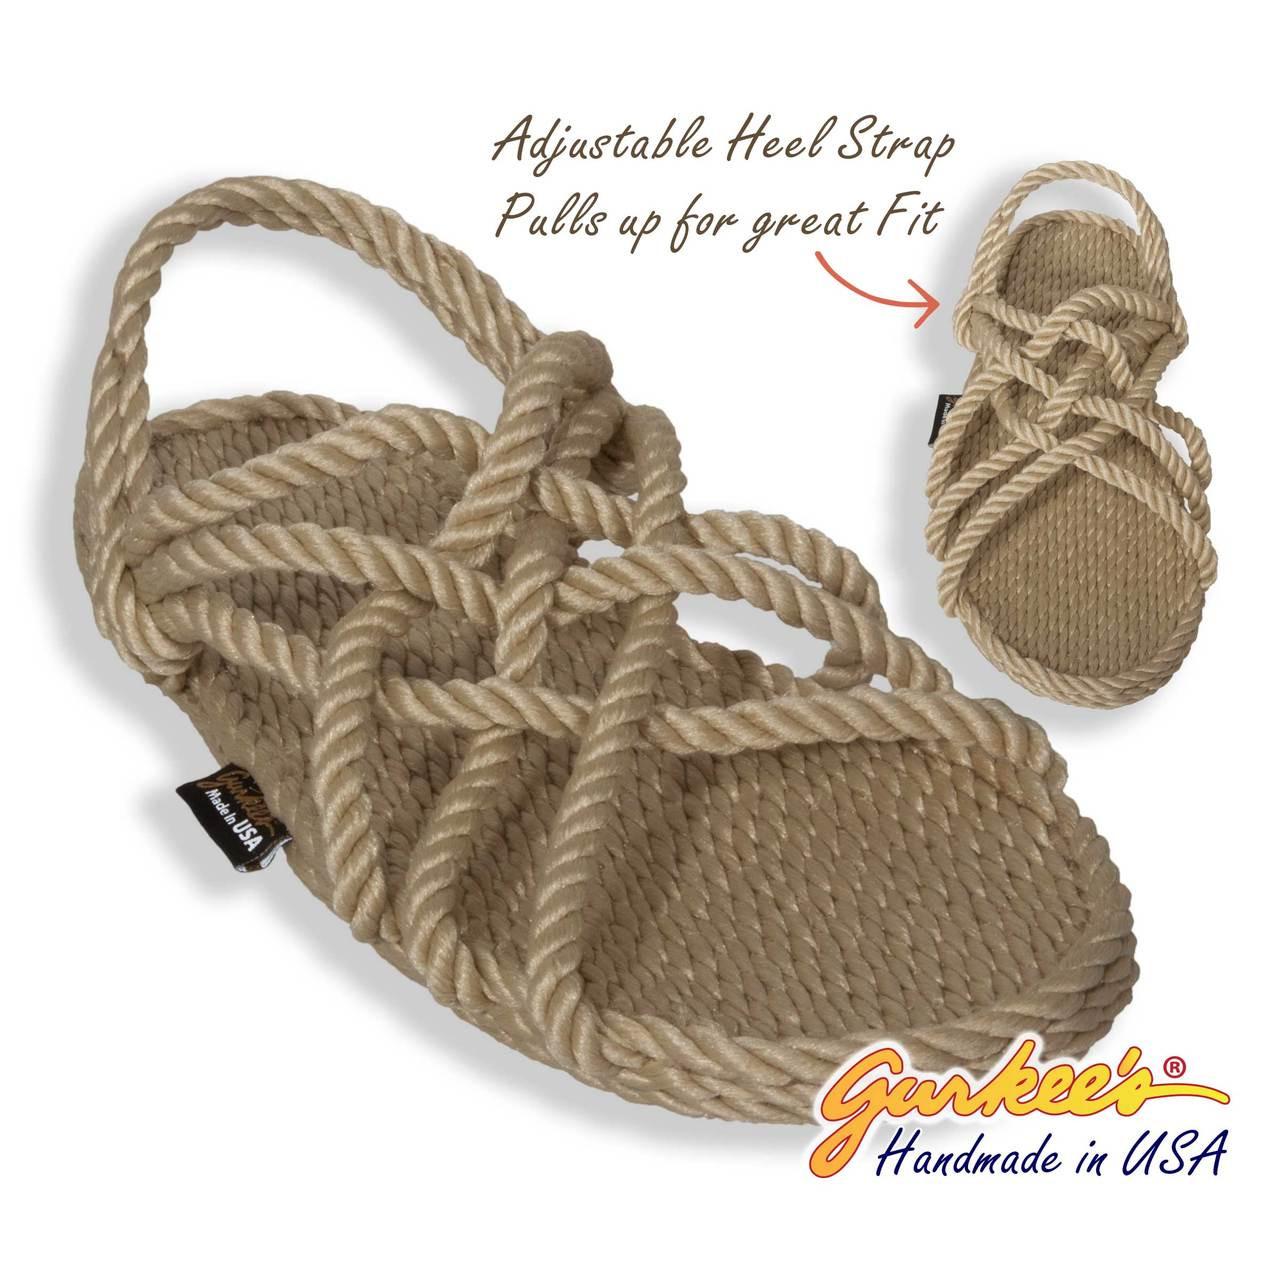 c55357b5f79d Classic Neptune Tan Rope Sandals - Gurkee s